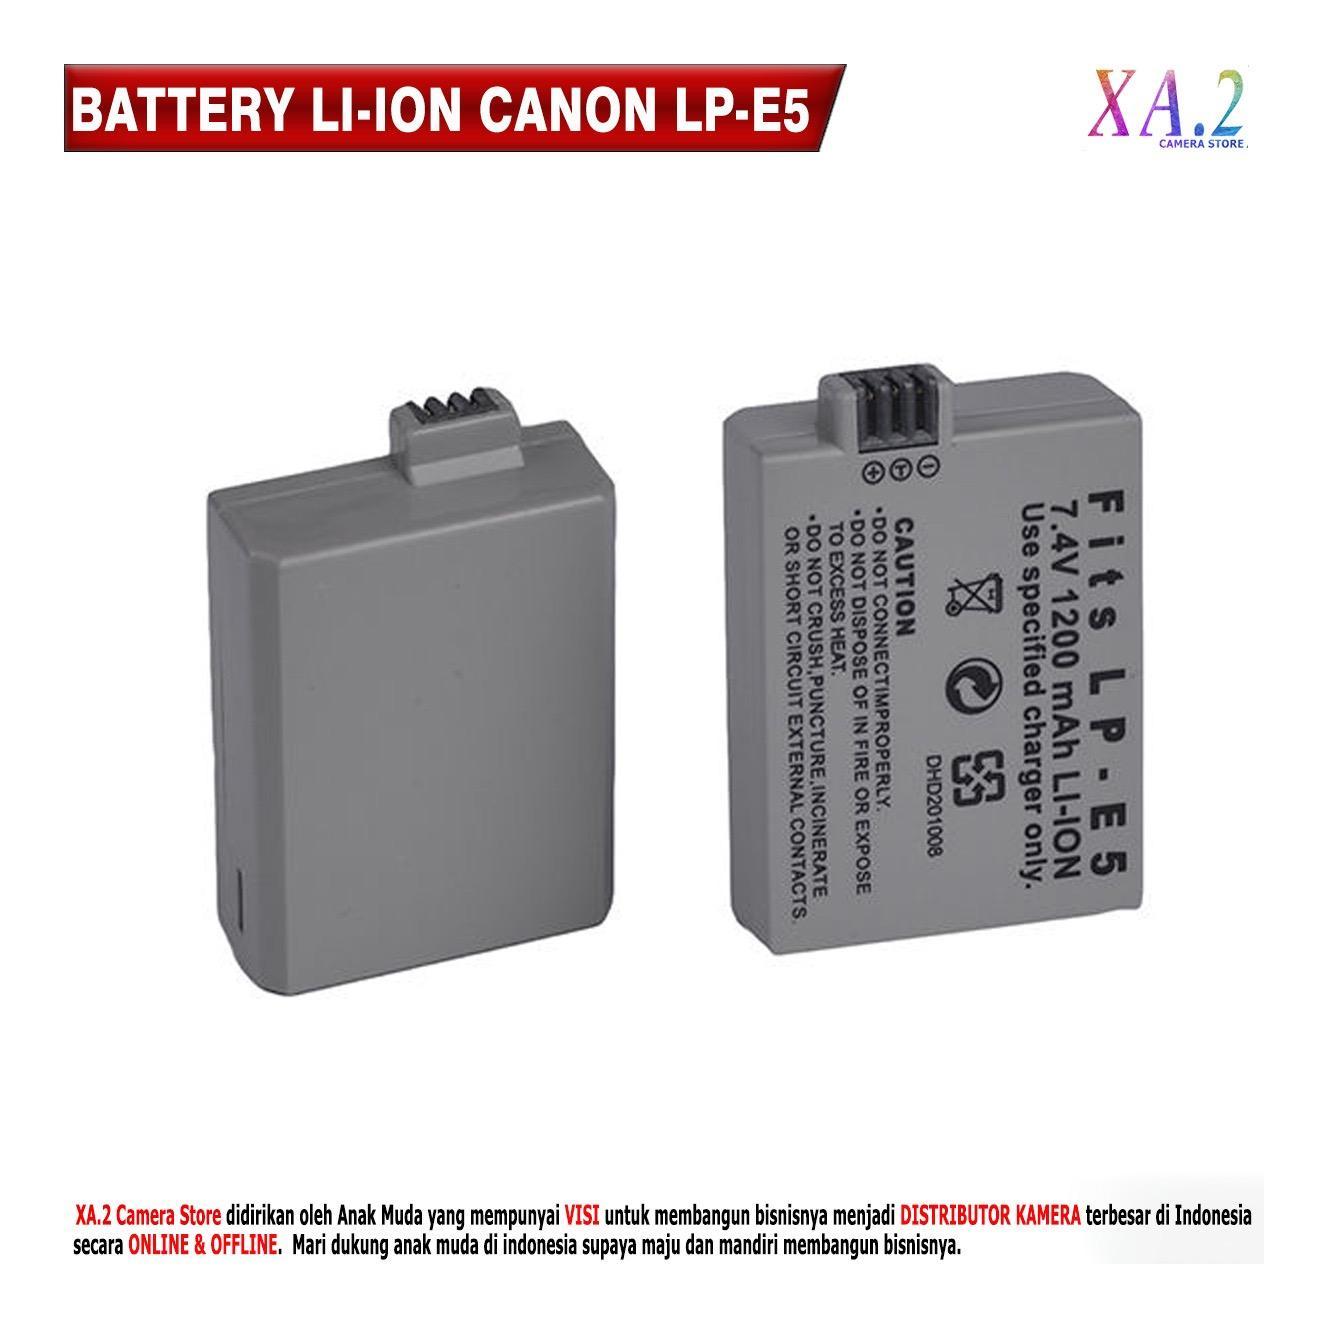 Baterai Pengganti Canon LP-E5 1200 MAh EOS 1000D - 450D - 500D - Kiss F - Kiss X2 - Kiss X3 - Rebel T1i - Rebel XS - Rebel XSi